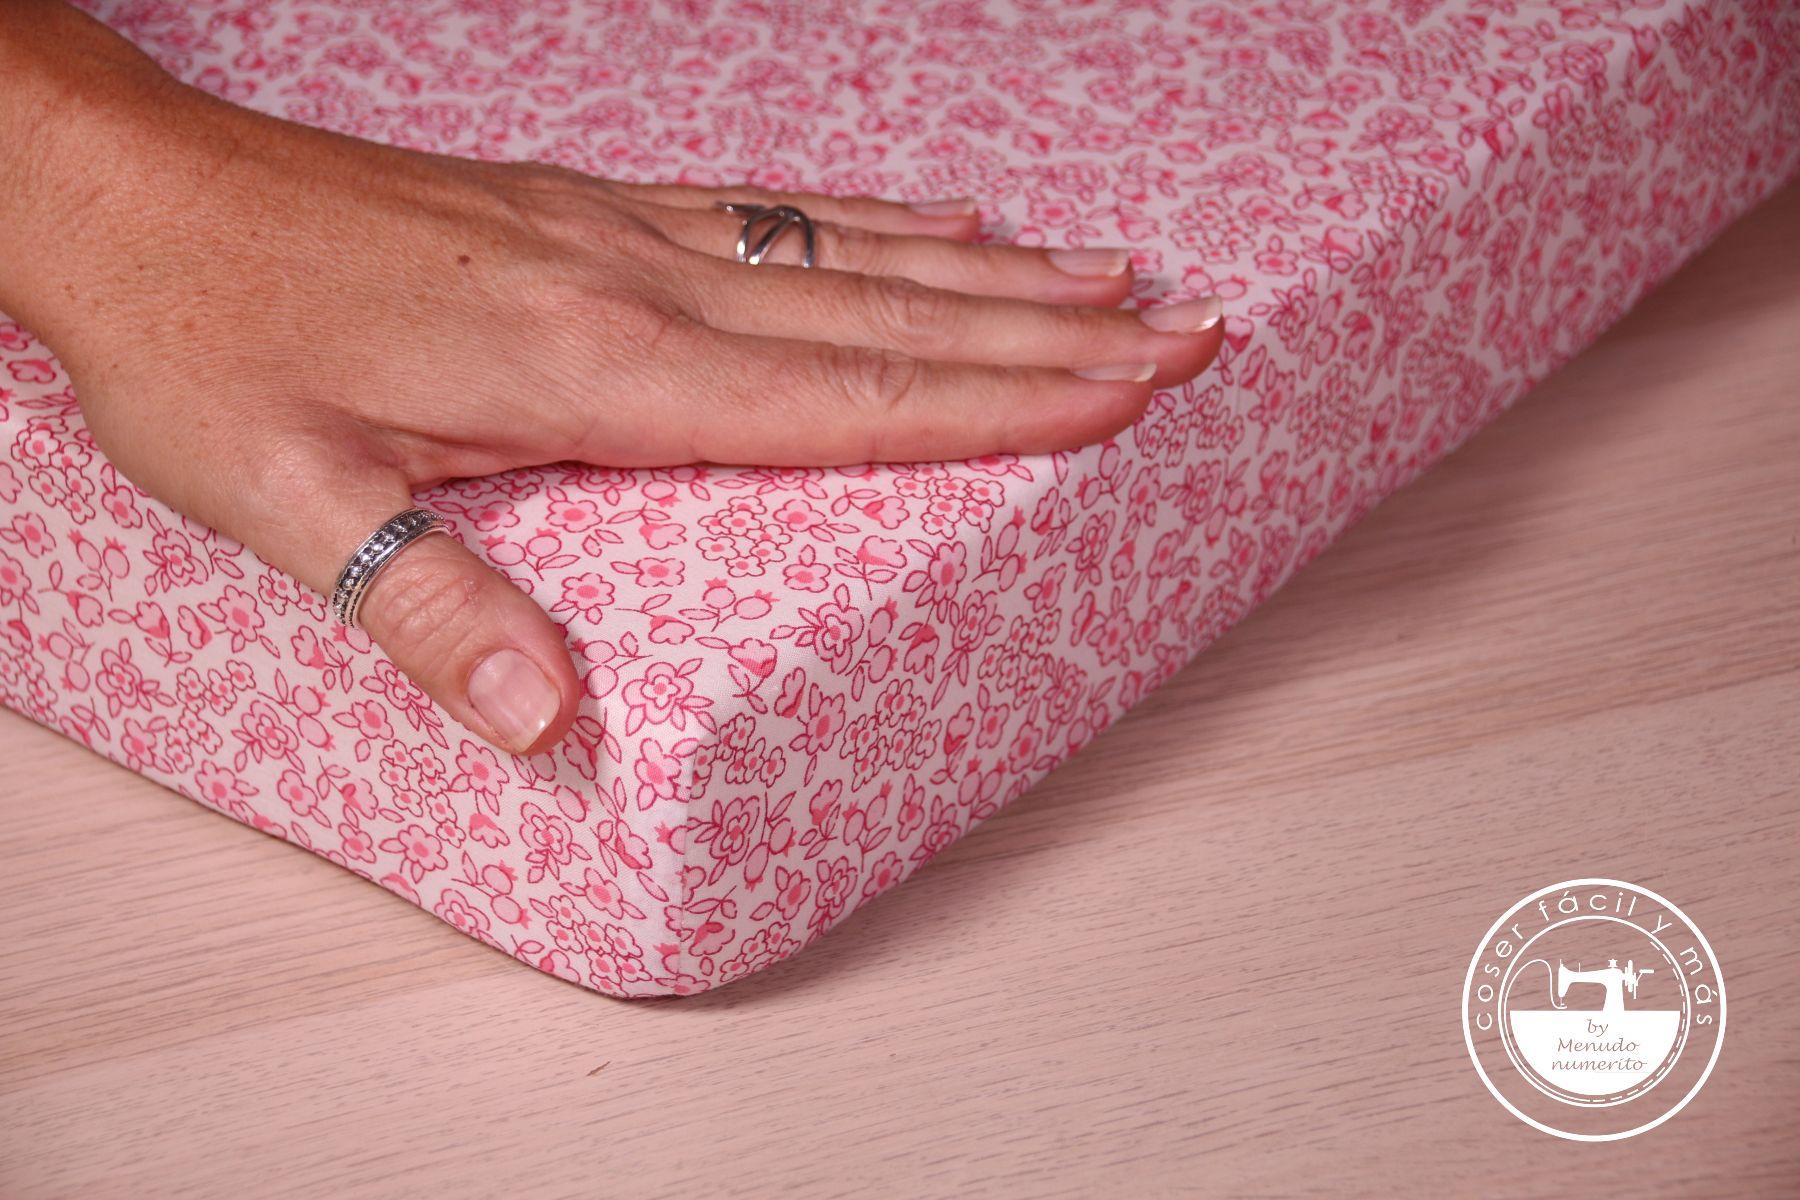 sabana ajustable coser facil menudo numerito blogs de costura